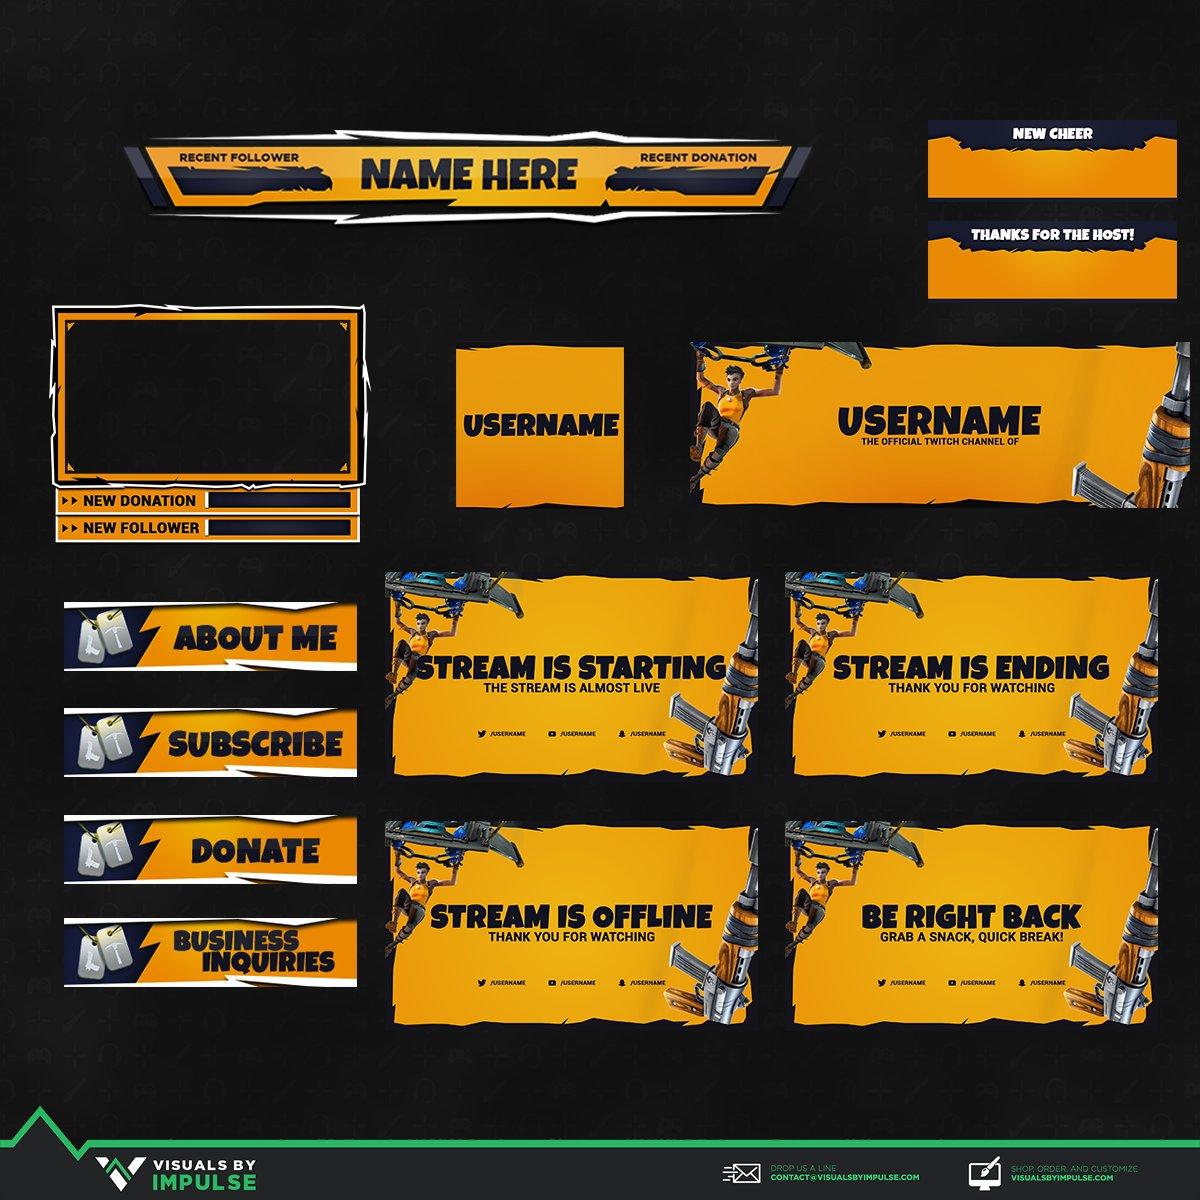 Fortnite Overlay | Fortnite Aimbot Working